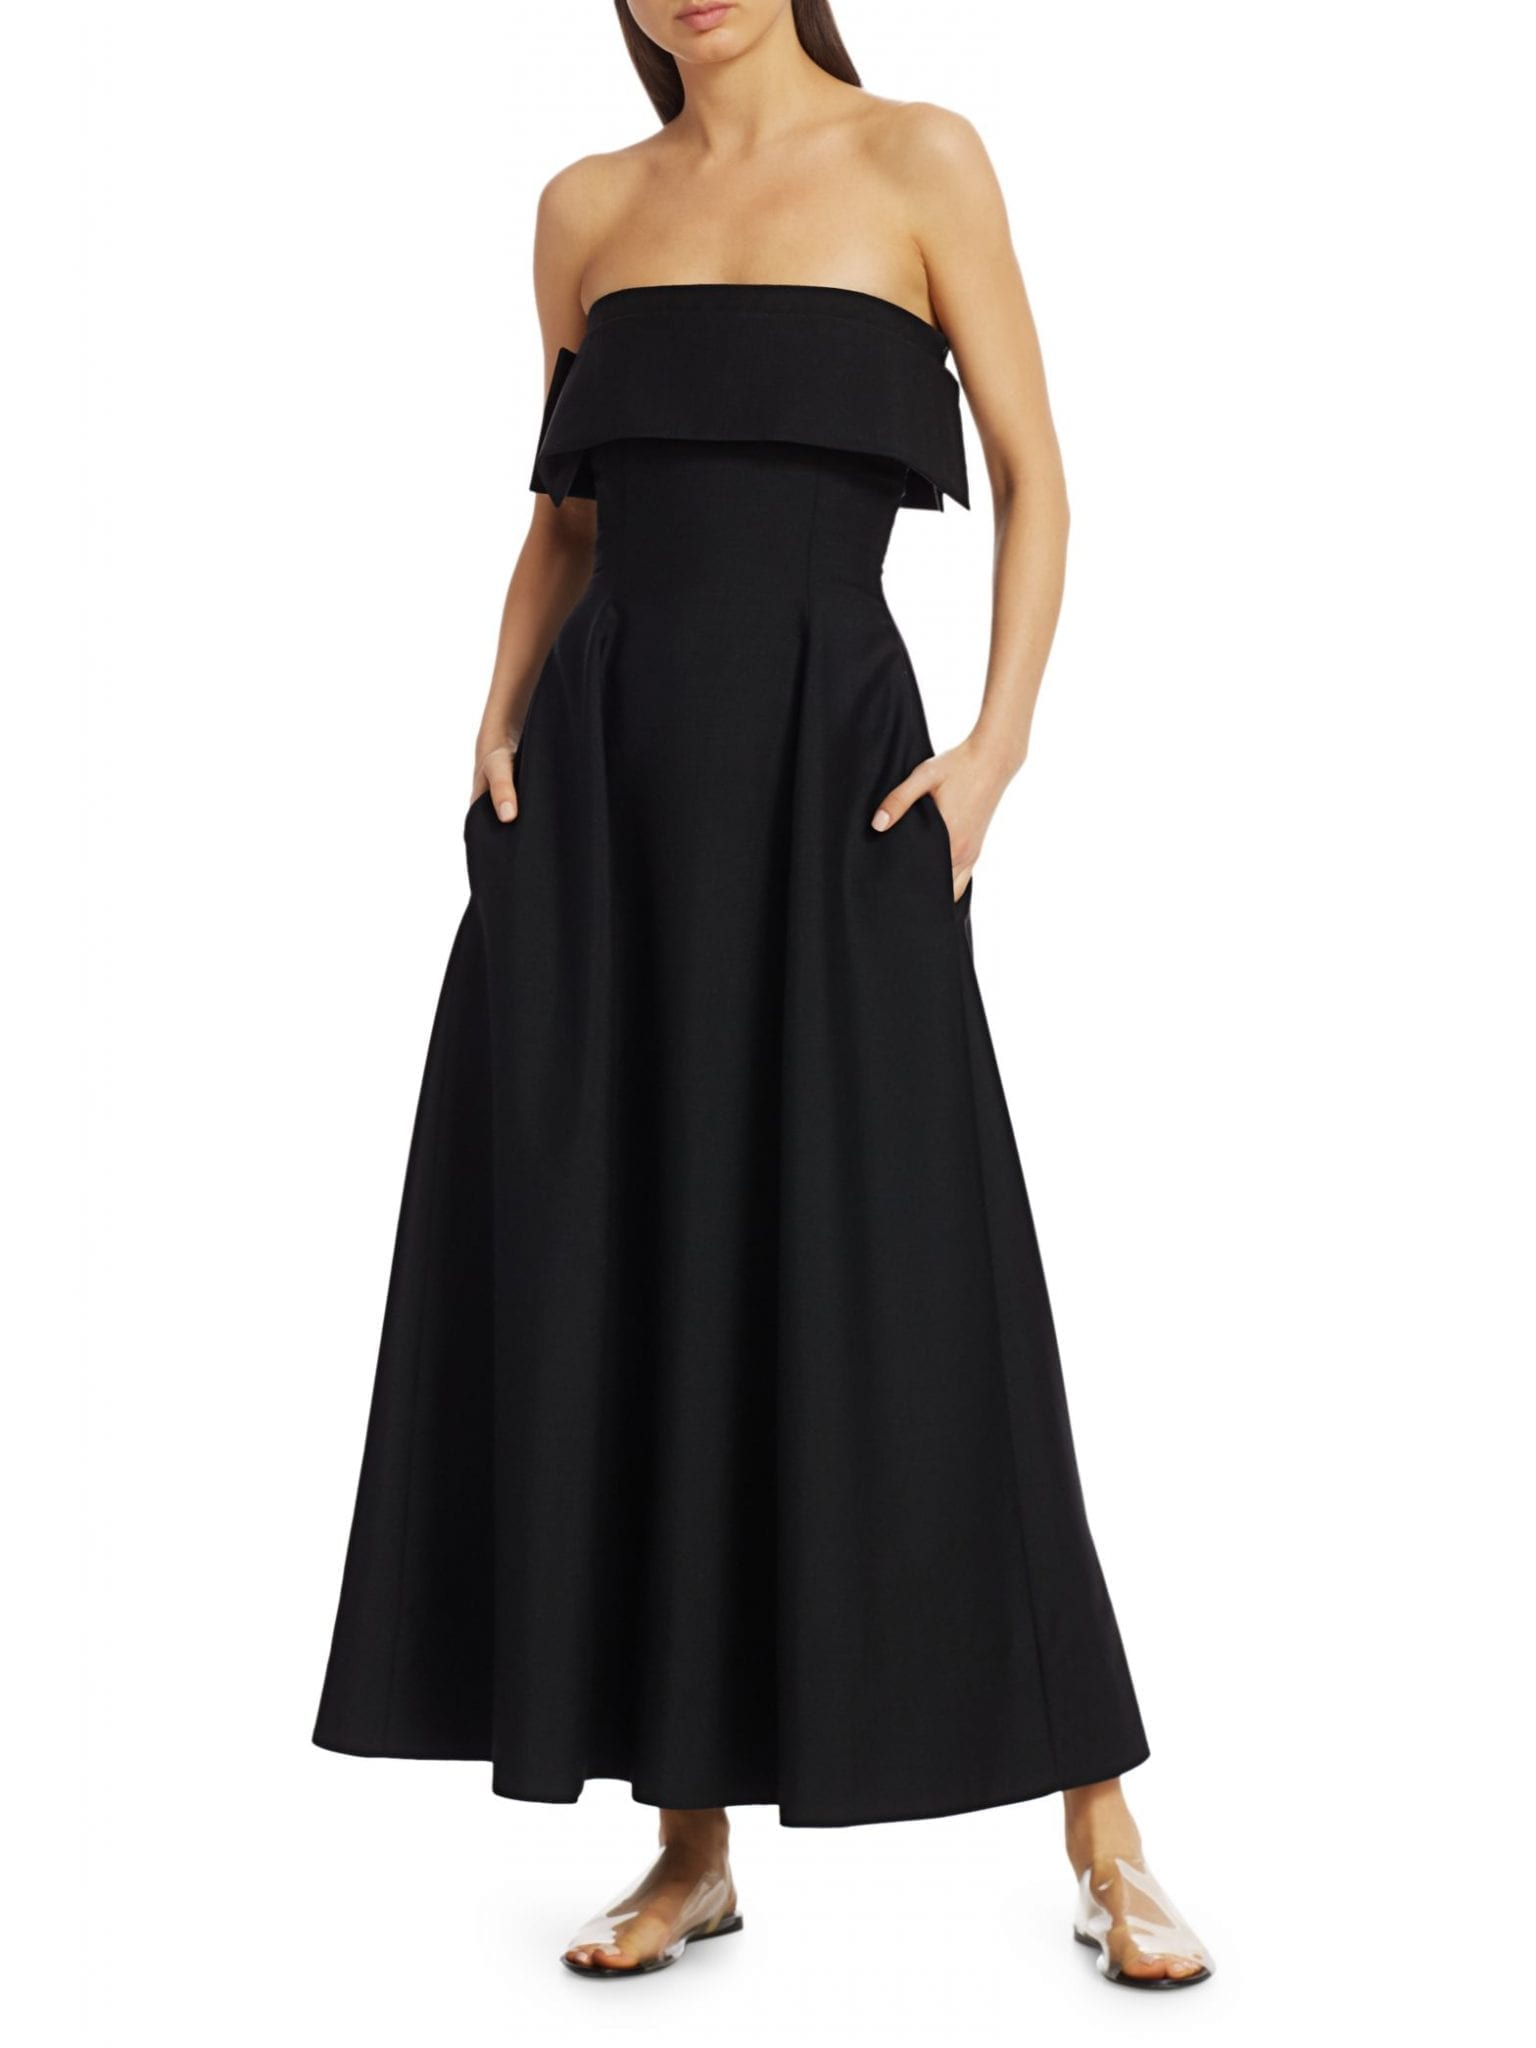 THE ROW Dario Mohair & Wool Dress